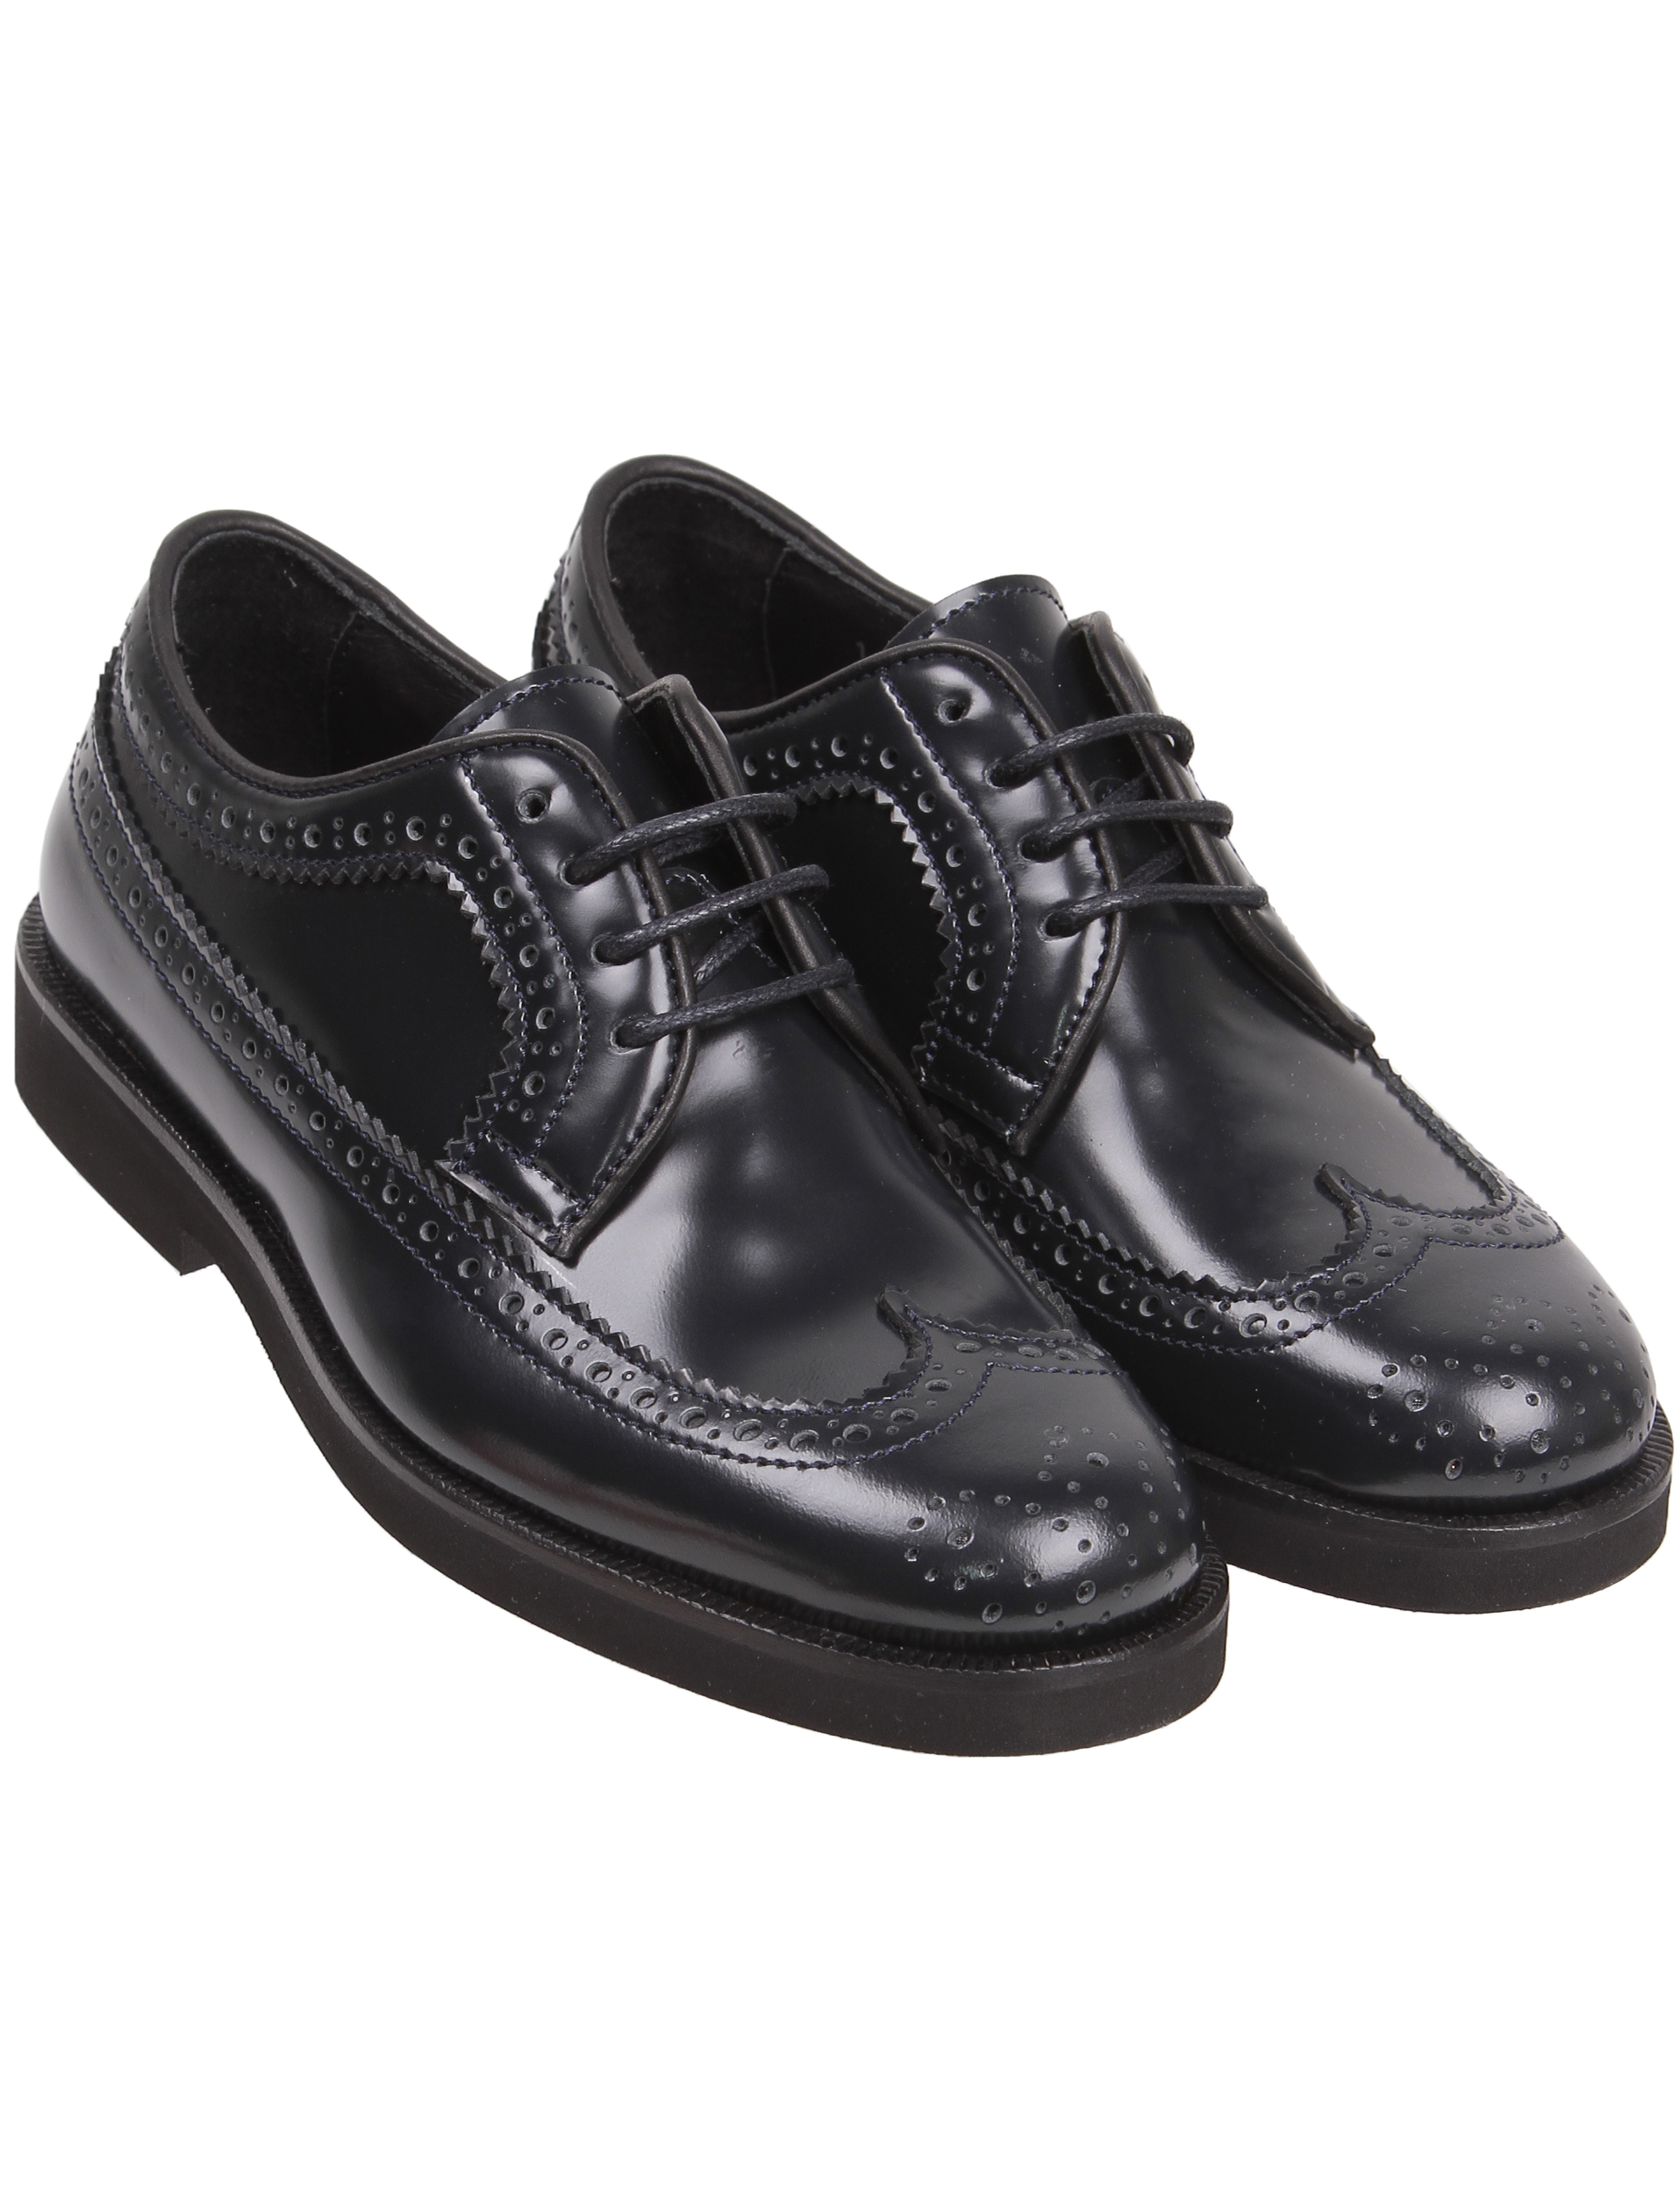 Ботинки RONDINELLA 2035013 фото